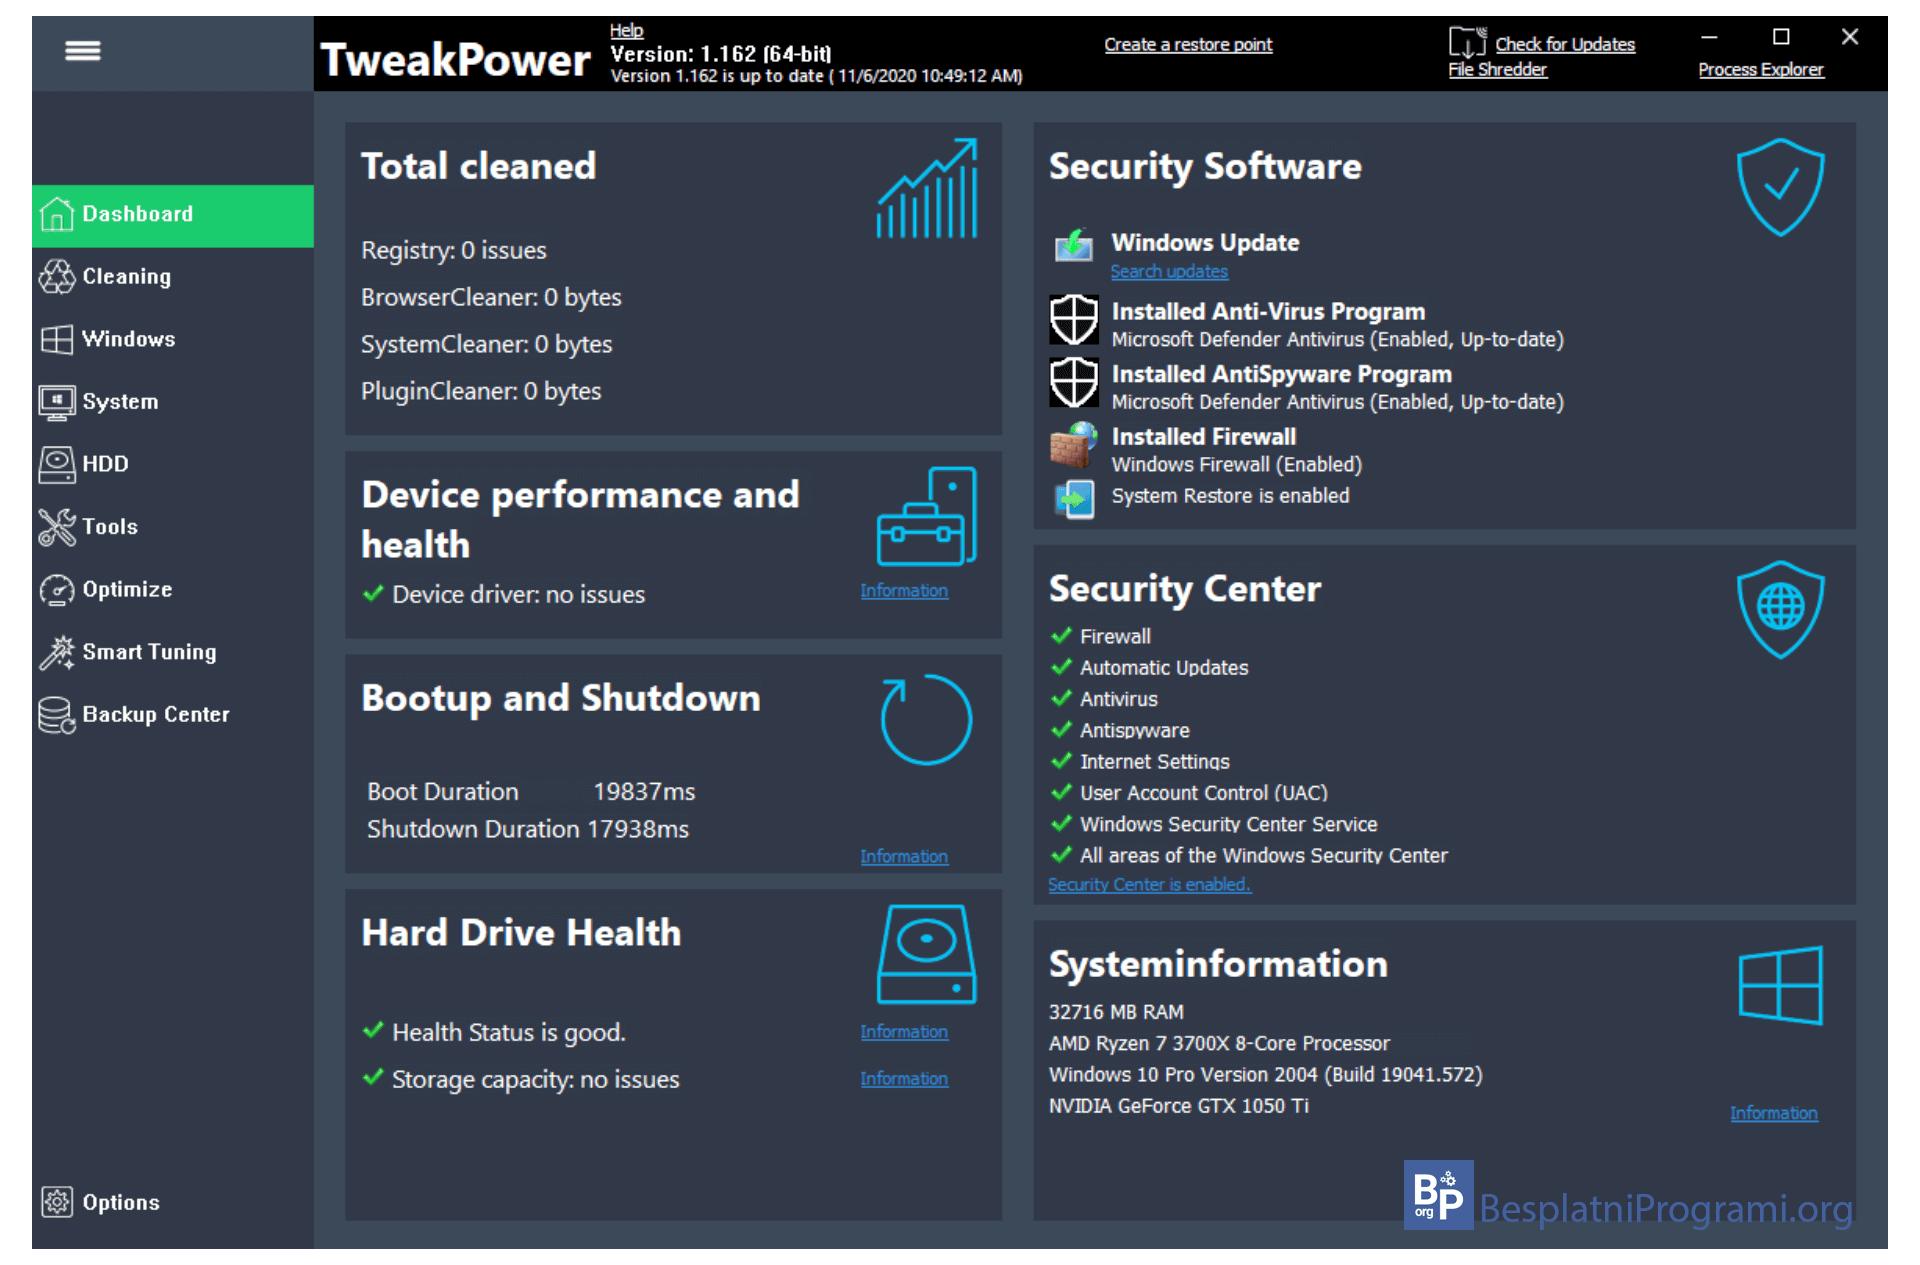 TweekPower Dashboard